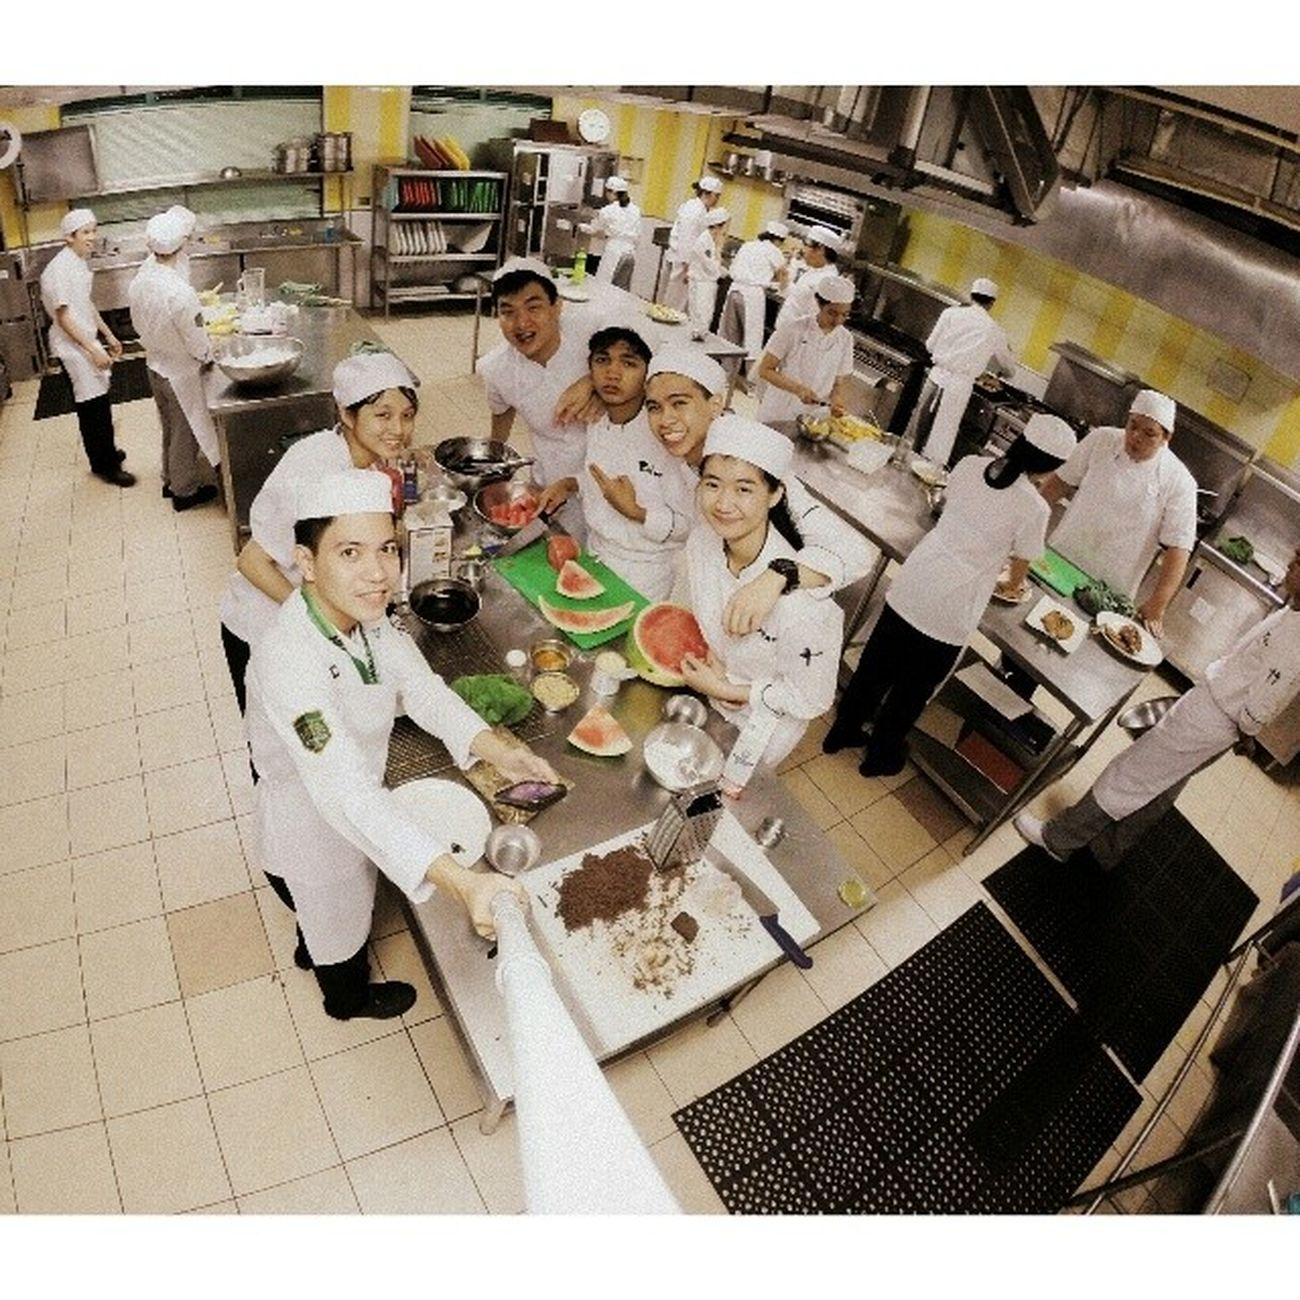 Friday class finale Marketbasket Chemlab Foodchemistry Gastronomy Benilde extraordinaire wefie gopro themanansala